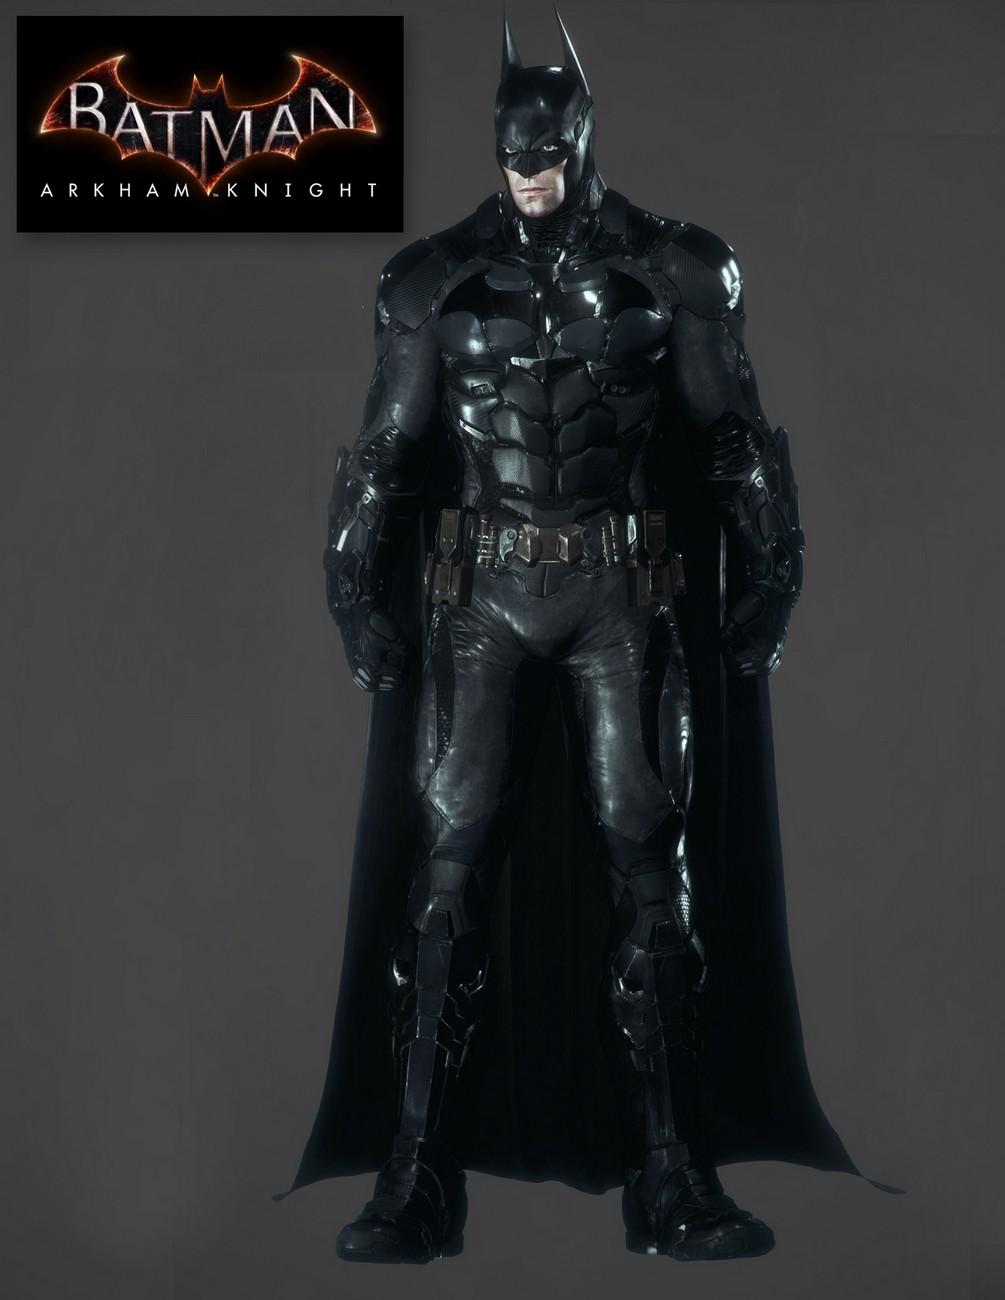 Closer Look: Batman Arkham Knight 1/4 Scale Action Figure ...